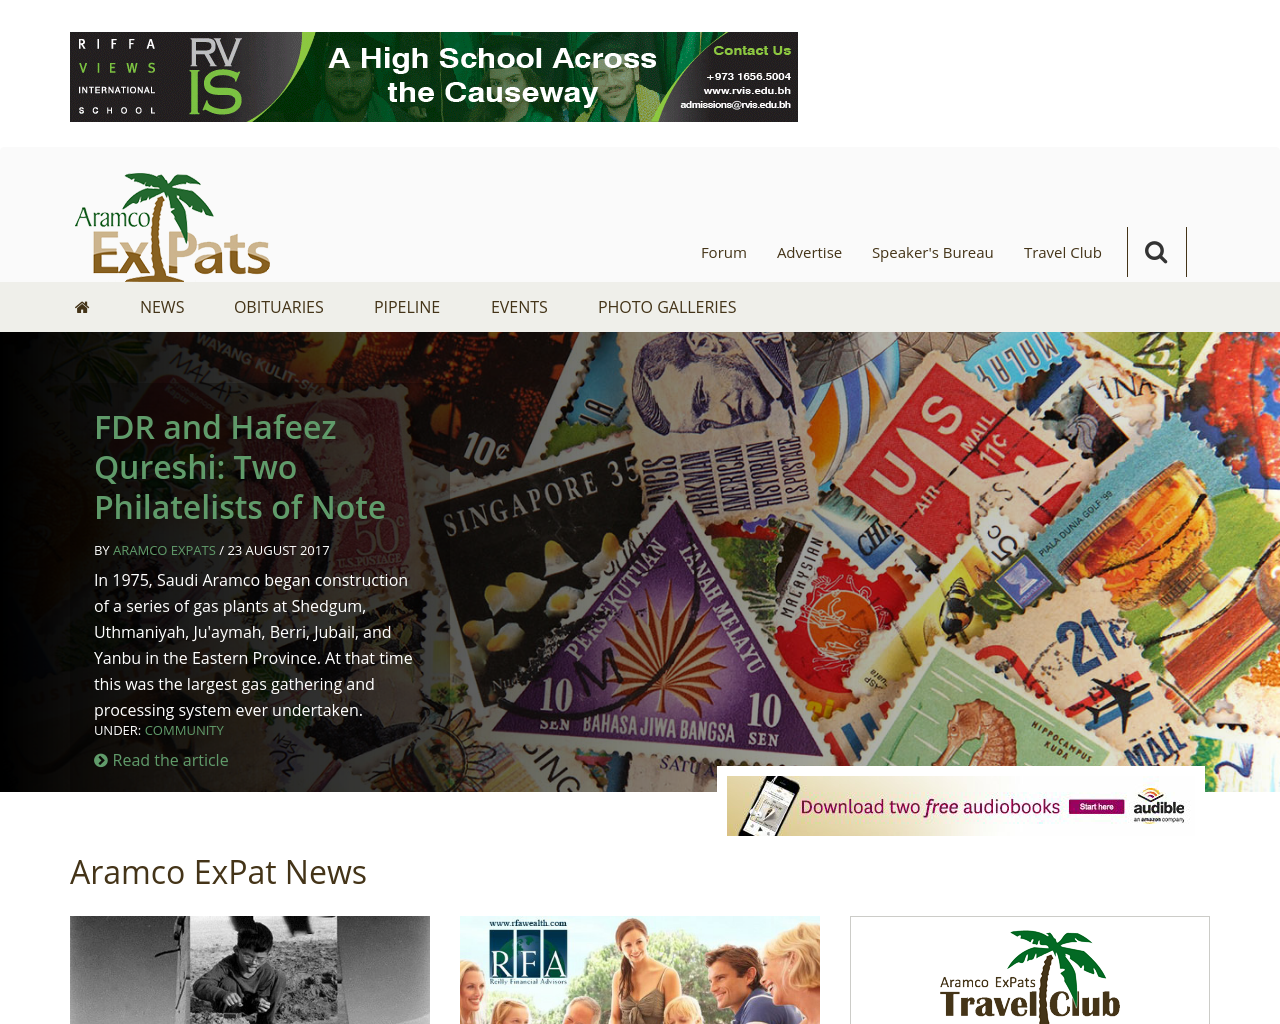 Aramco-ExPats-Advertising-Reviews-Pricing